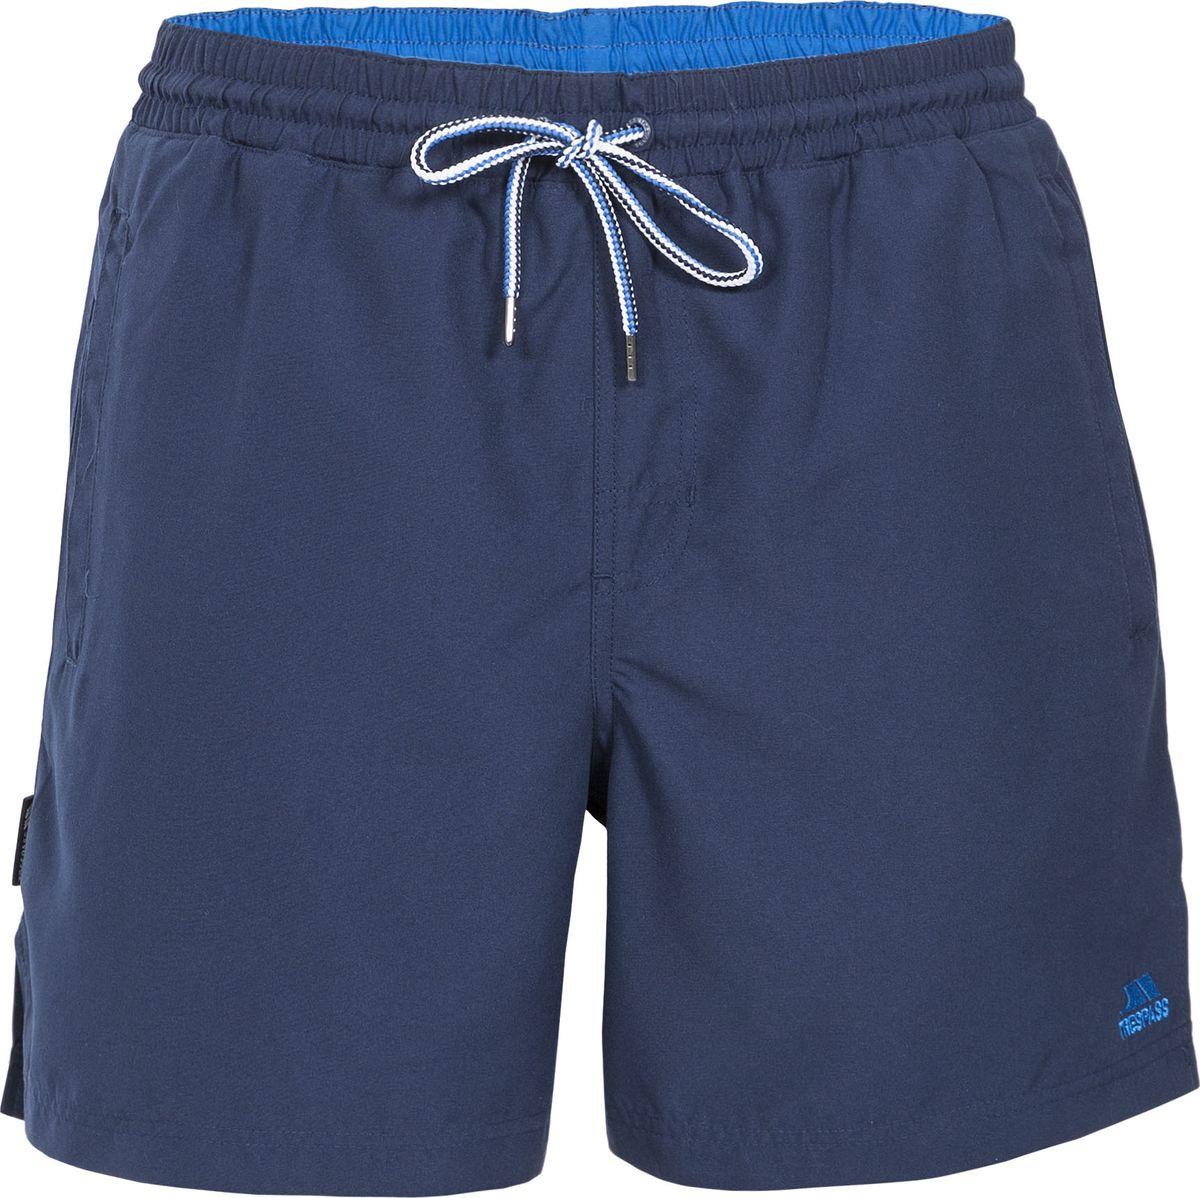 Шорты мужские Trespass Granvin, цвет: синий. MABTSHM10014. Размер M (50) шорты trespass шорты